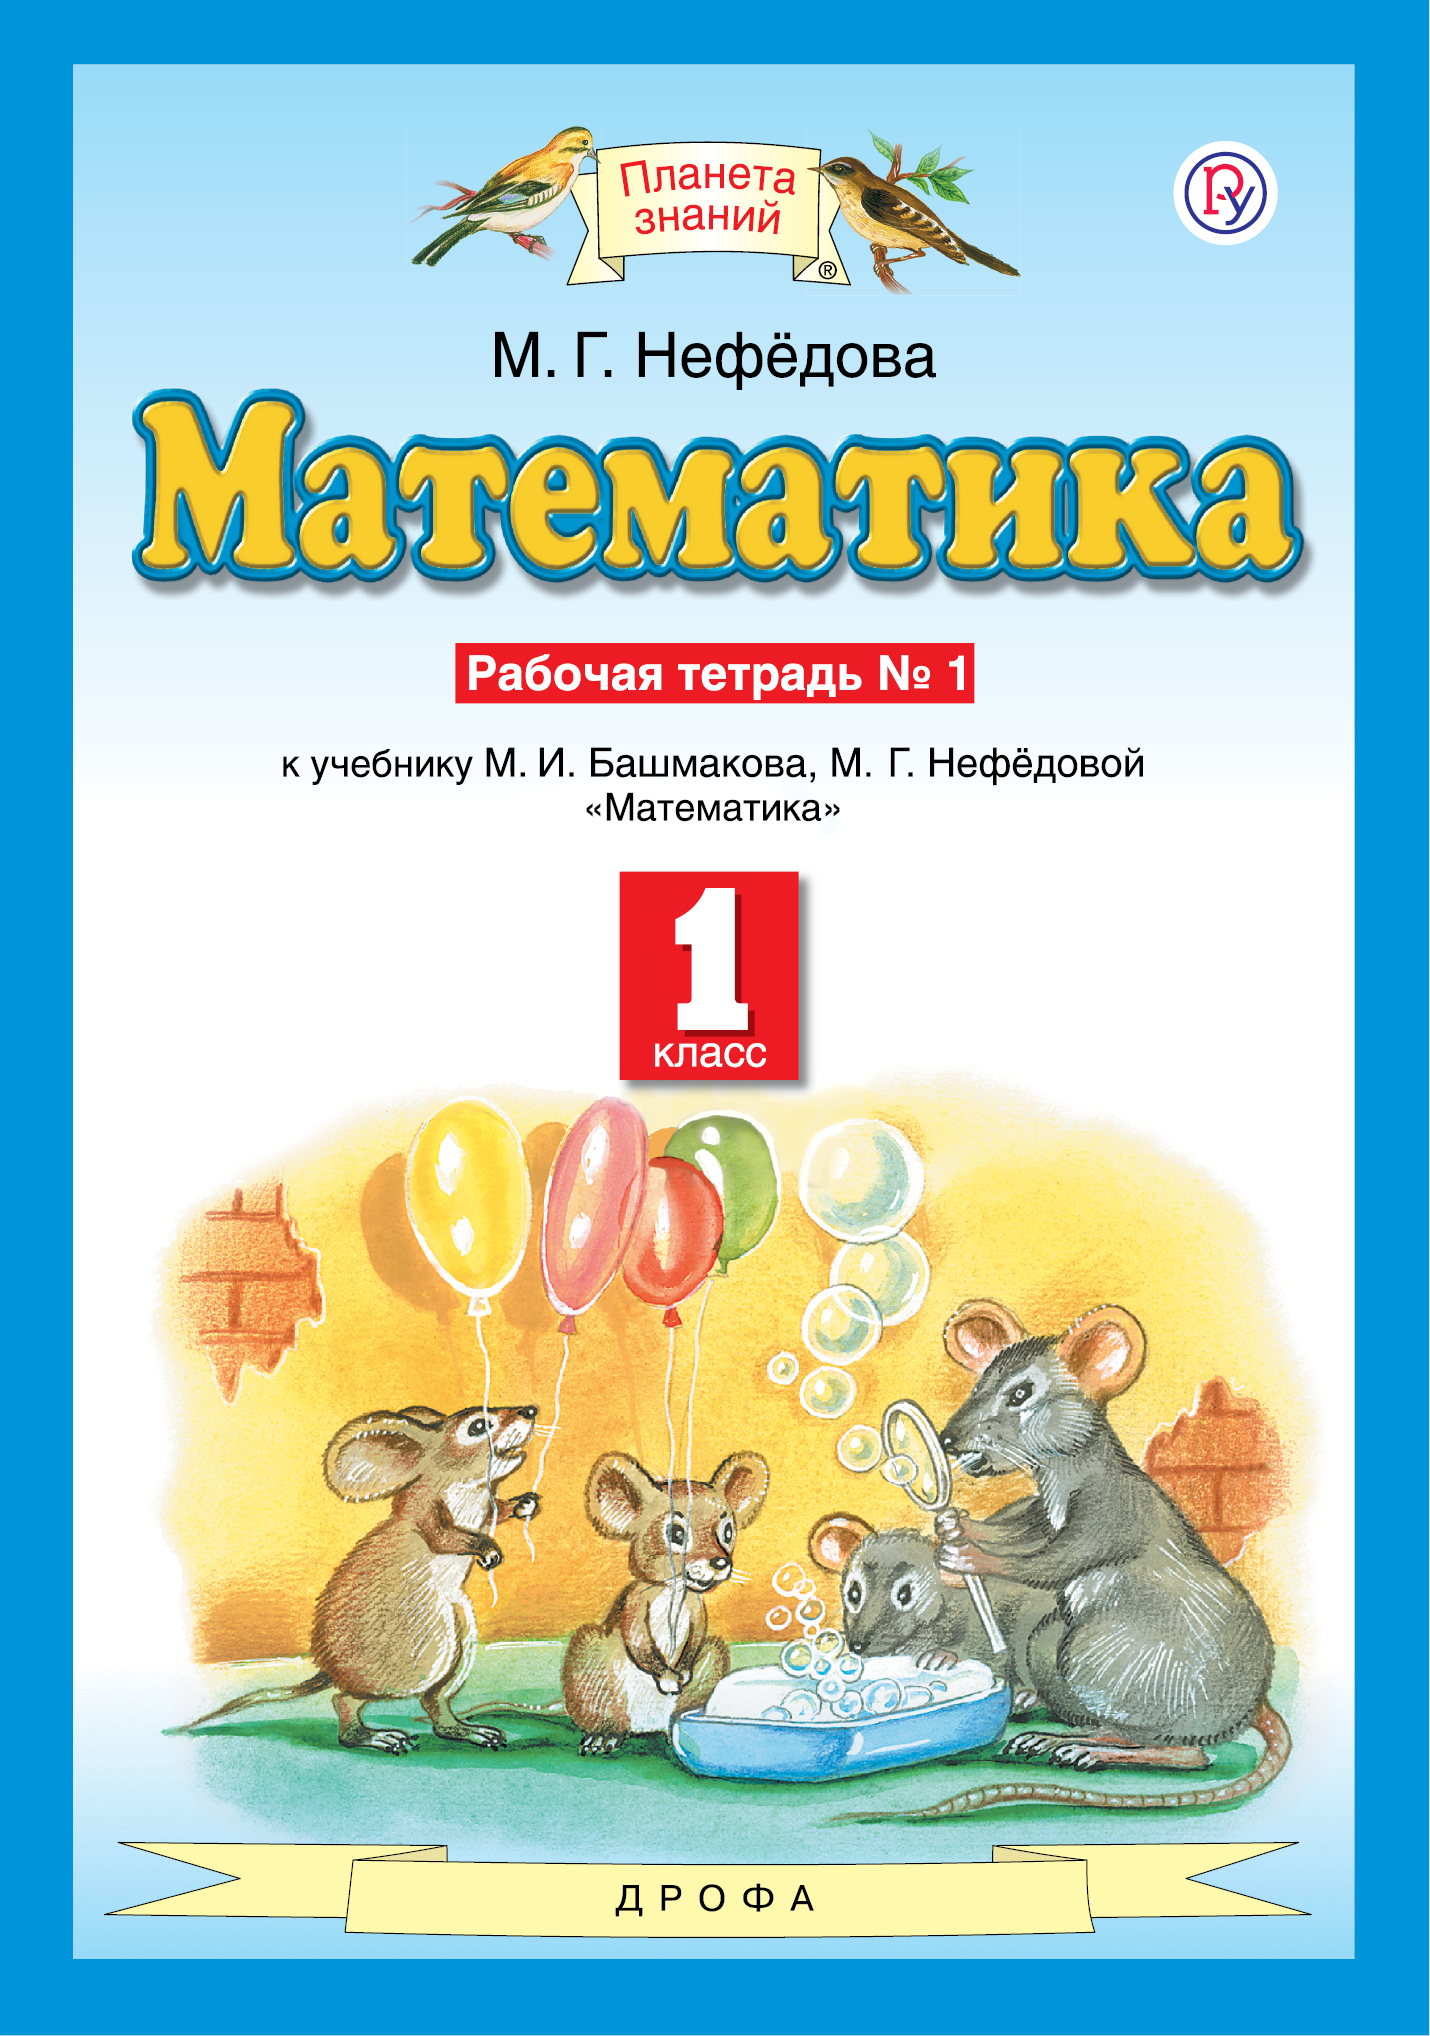 Нефёдова М.Г. Математика. 1 класс. Рабочая тетрадь №1